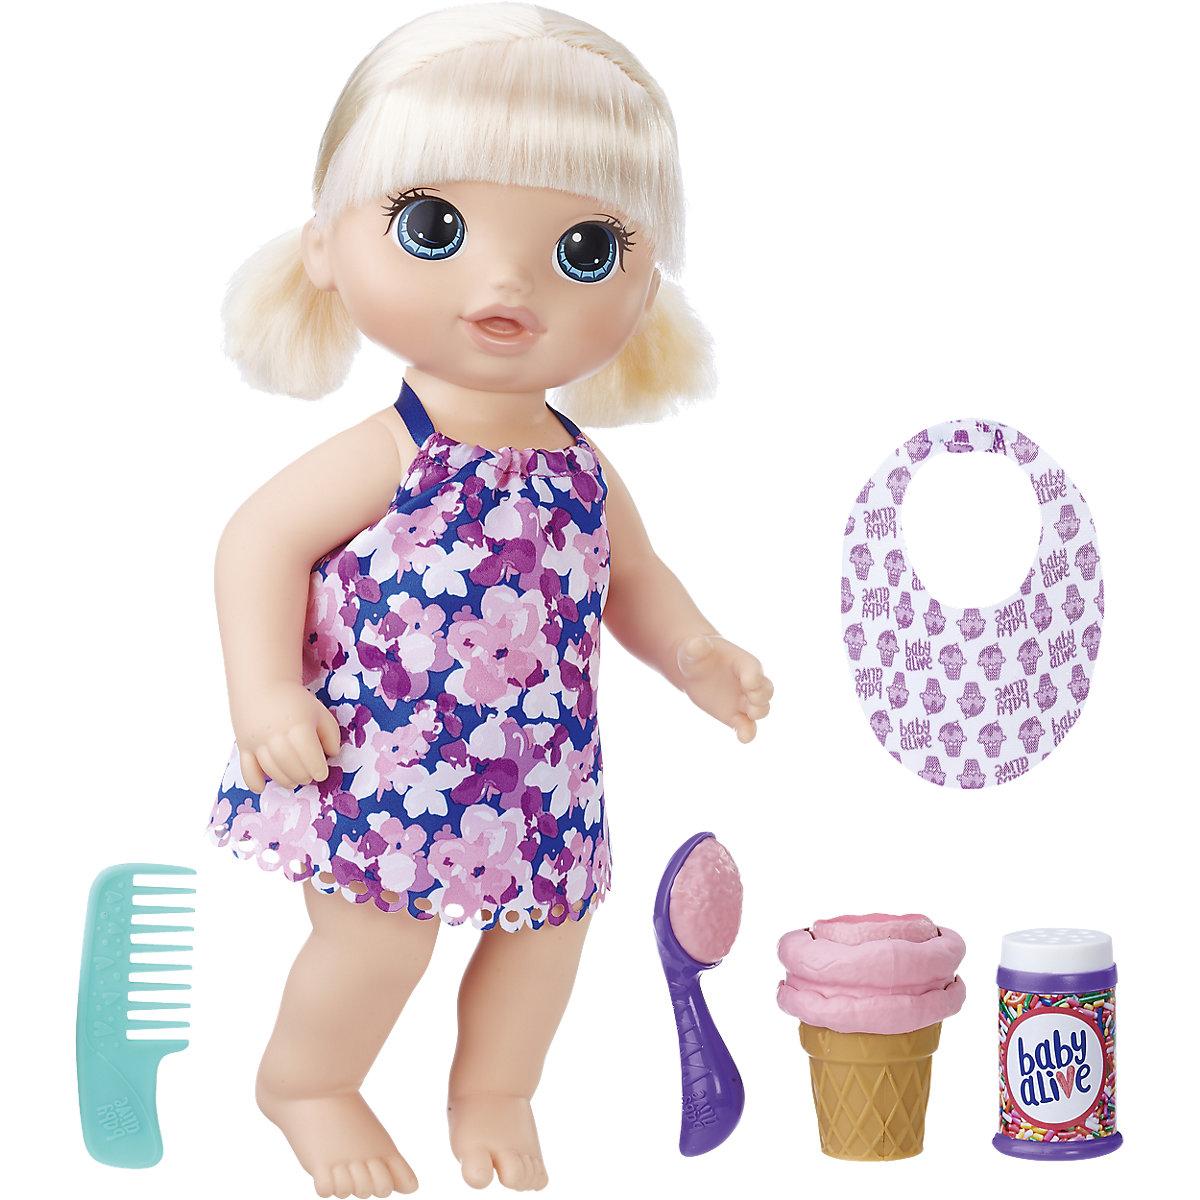 Hasbro Baby Alive blonďatá panenka se zmrzlinou